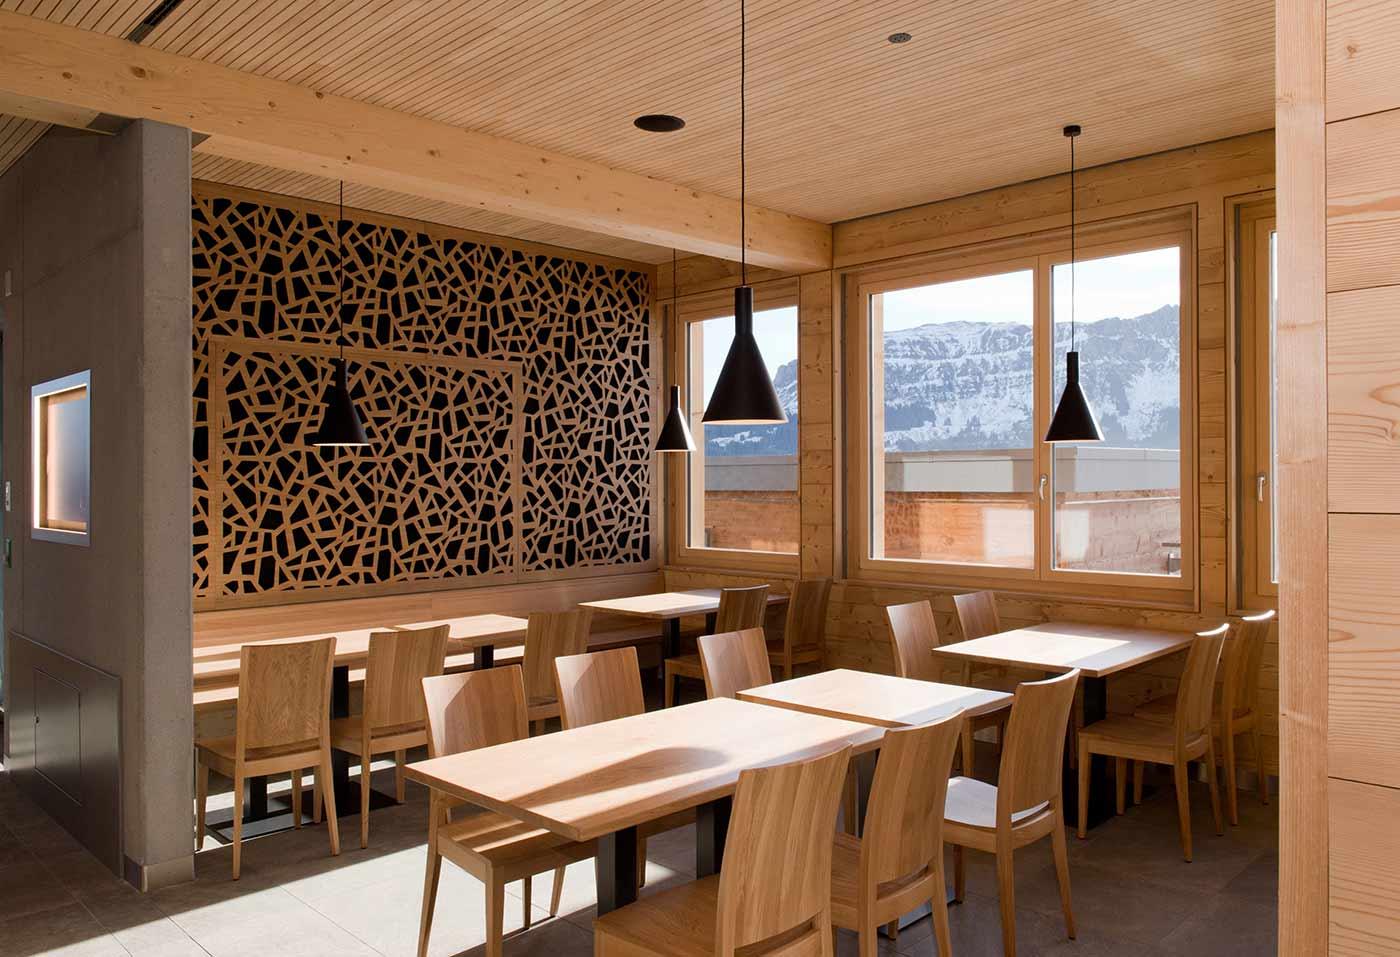 Wall-Cladding-Bruag_Oak-Plywood-18mm_Perforation-50100-scaled_Mountain-Restaurant-Prodalp-Flums.jpg